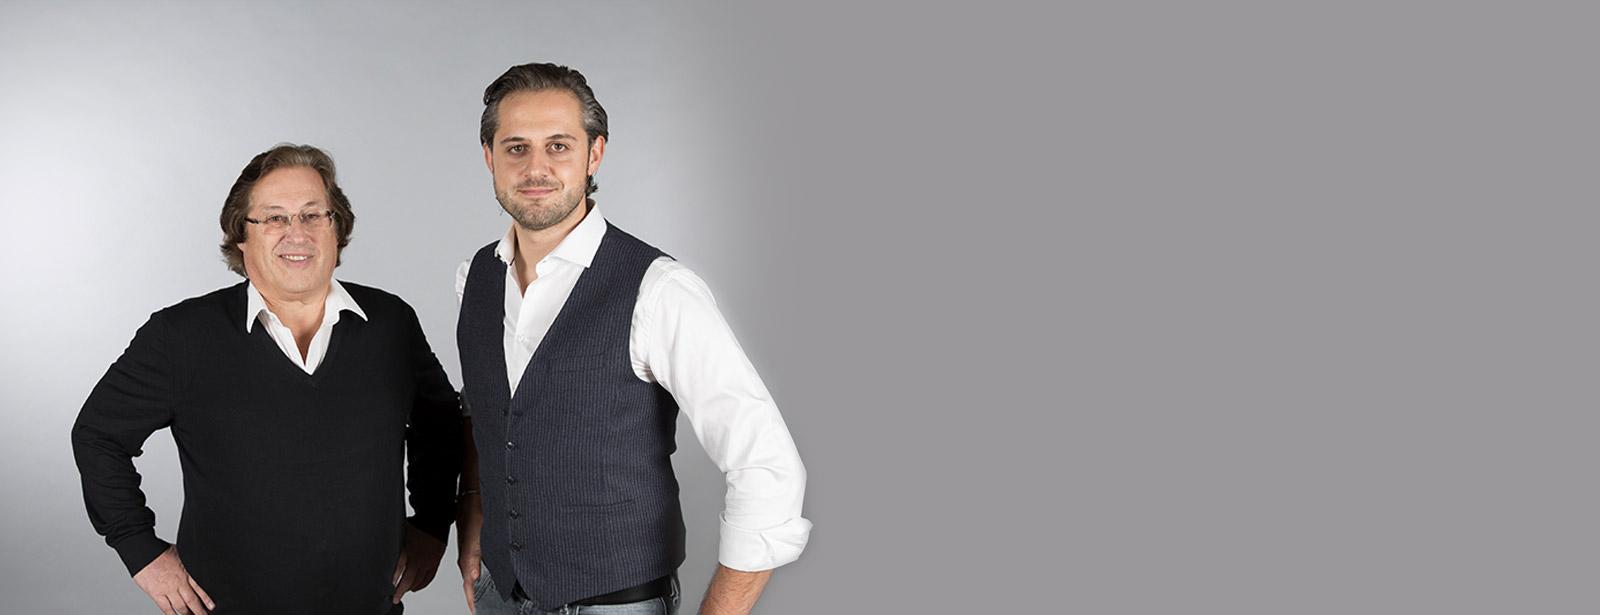 Philipp-Marcus Sattler